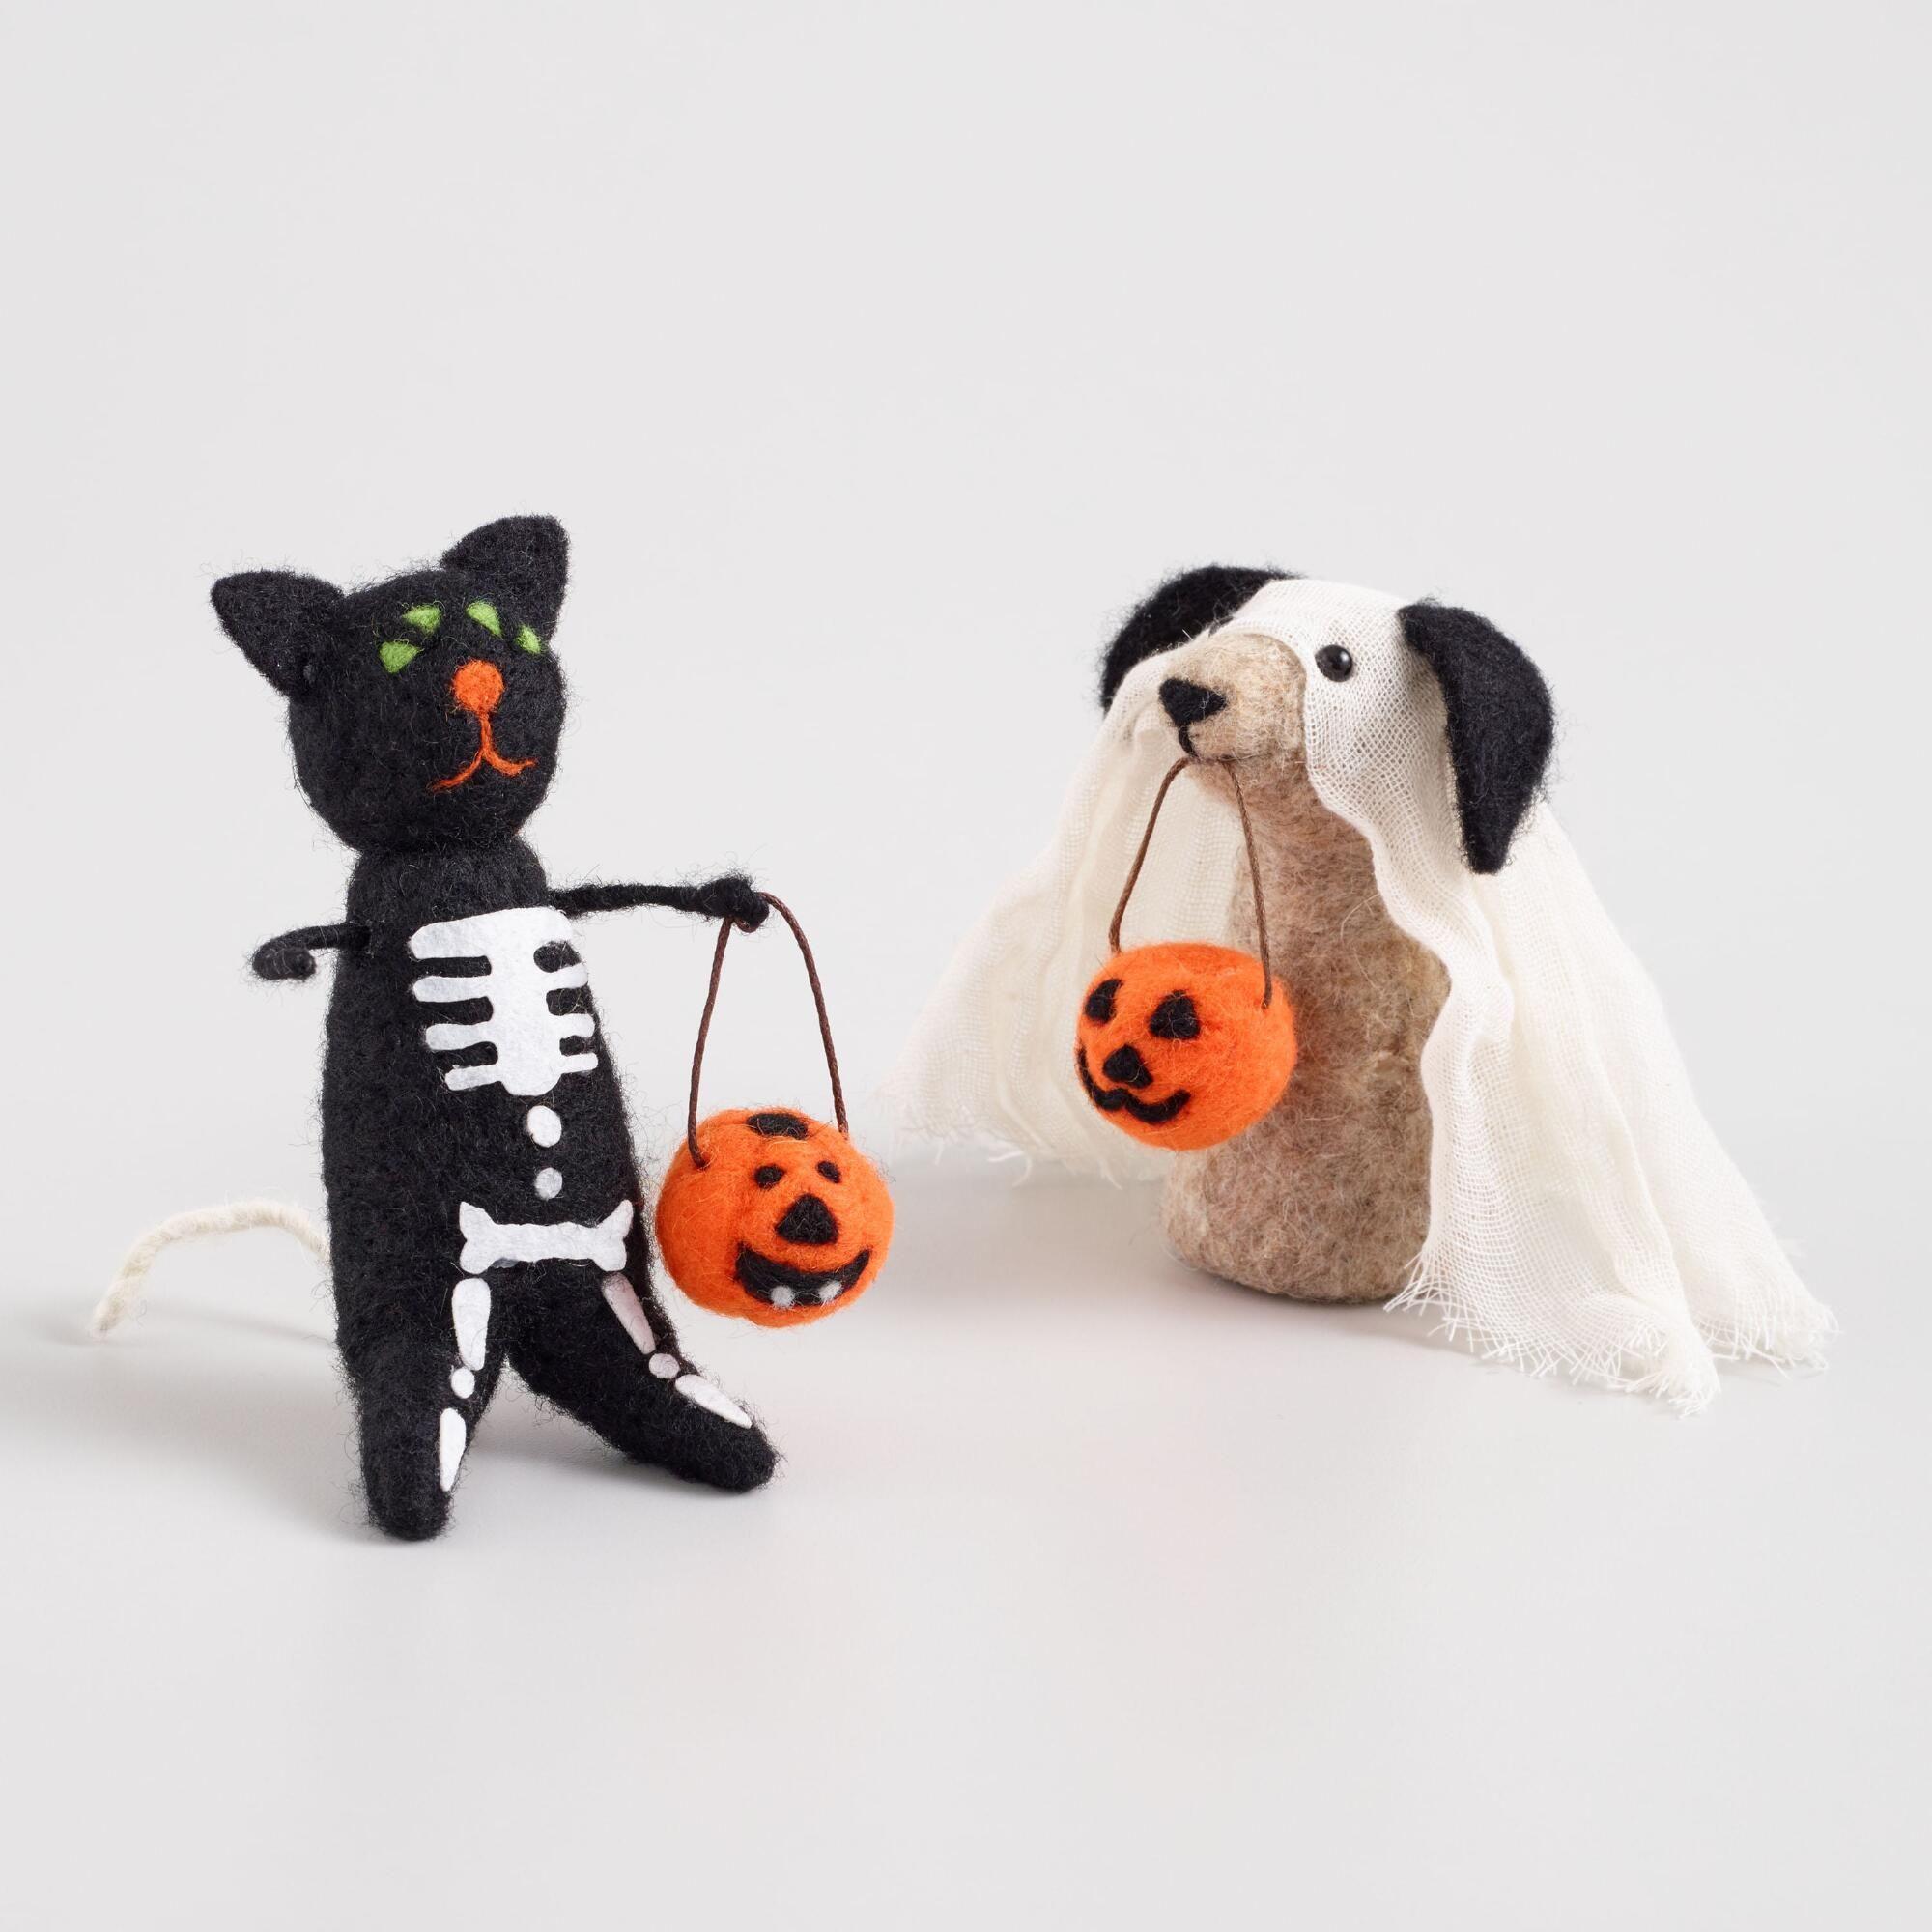 Felted Wool Dog And Cat Halloween Decor Set Of 2 By World Market Halloween Decorations Halloween Cat Halloween Entertaining